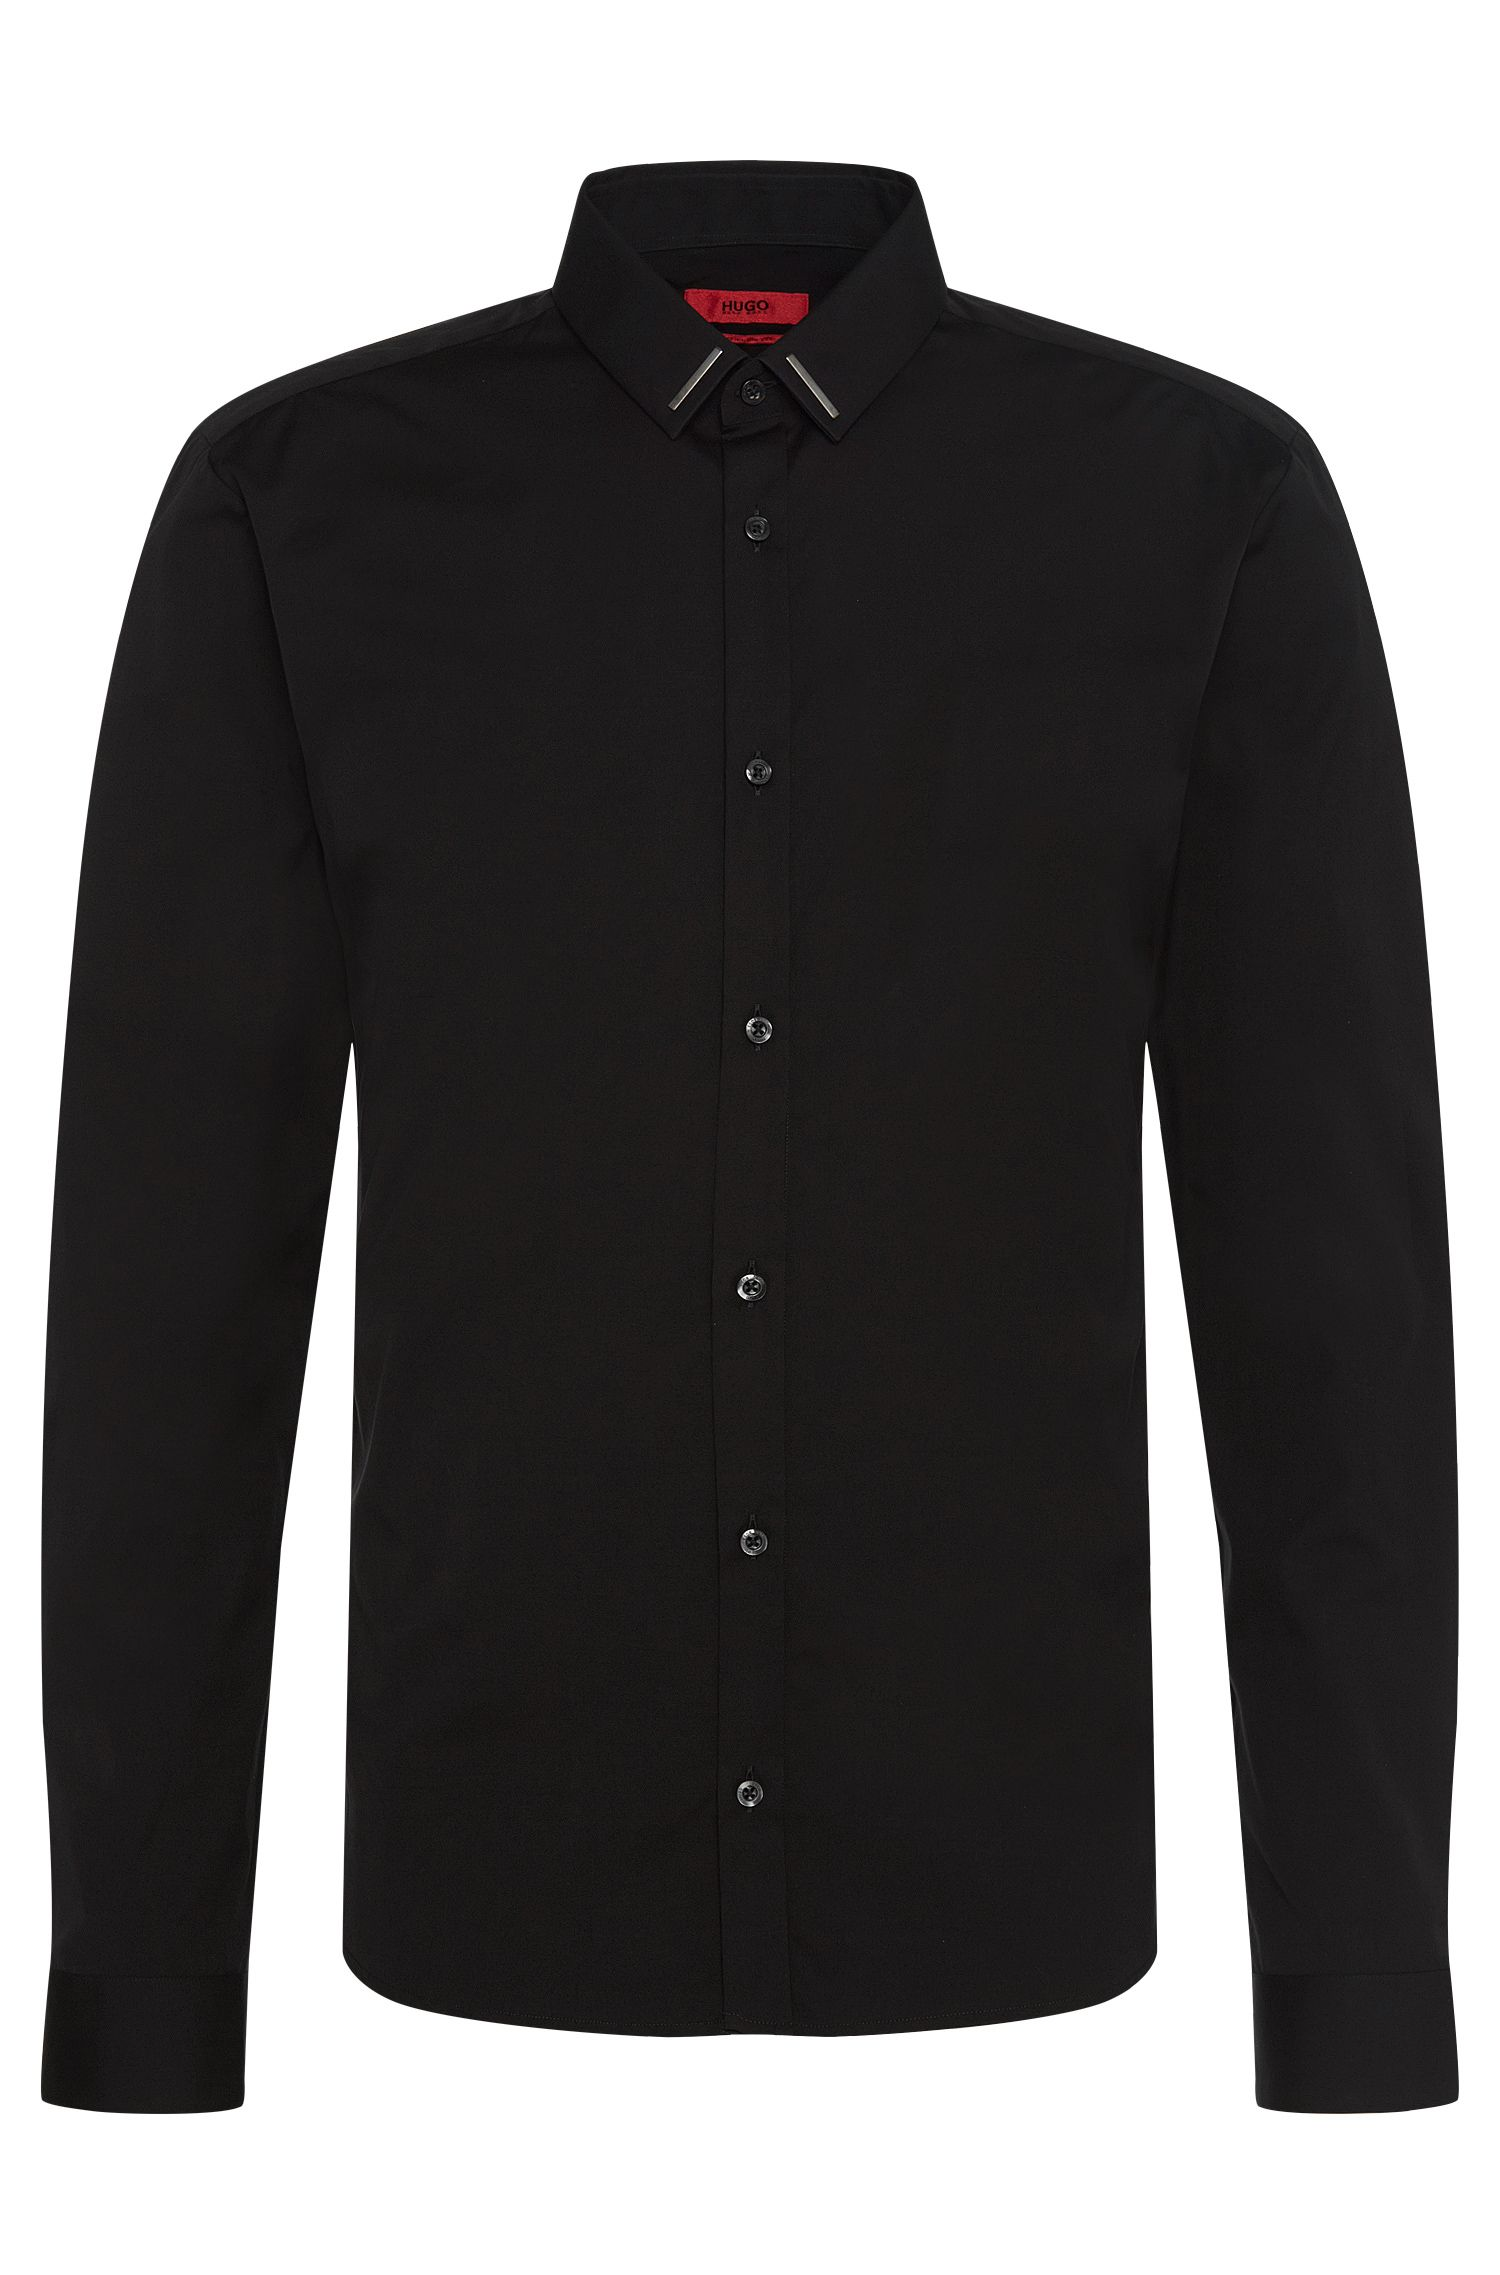 Stretch Cotton Button Down Shirt, Slim Fit | Ero